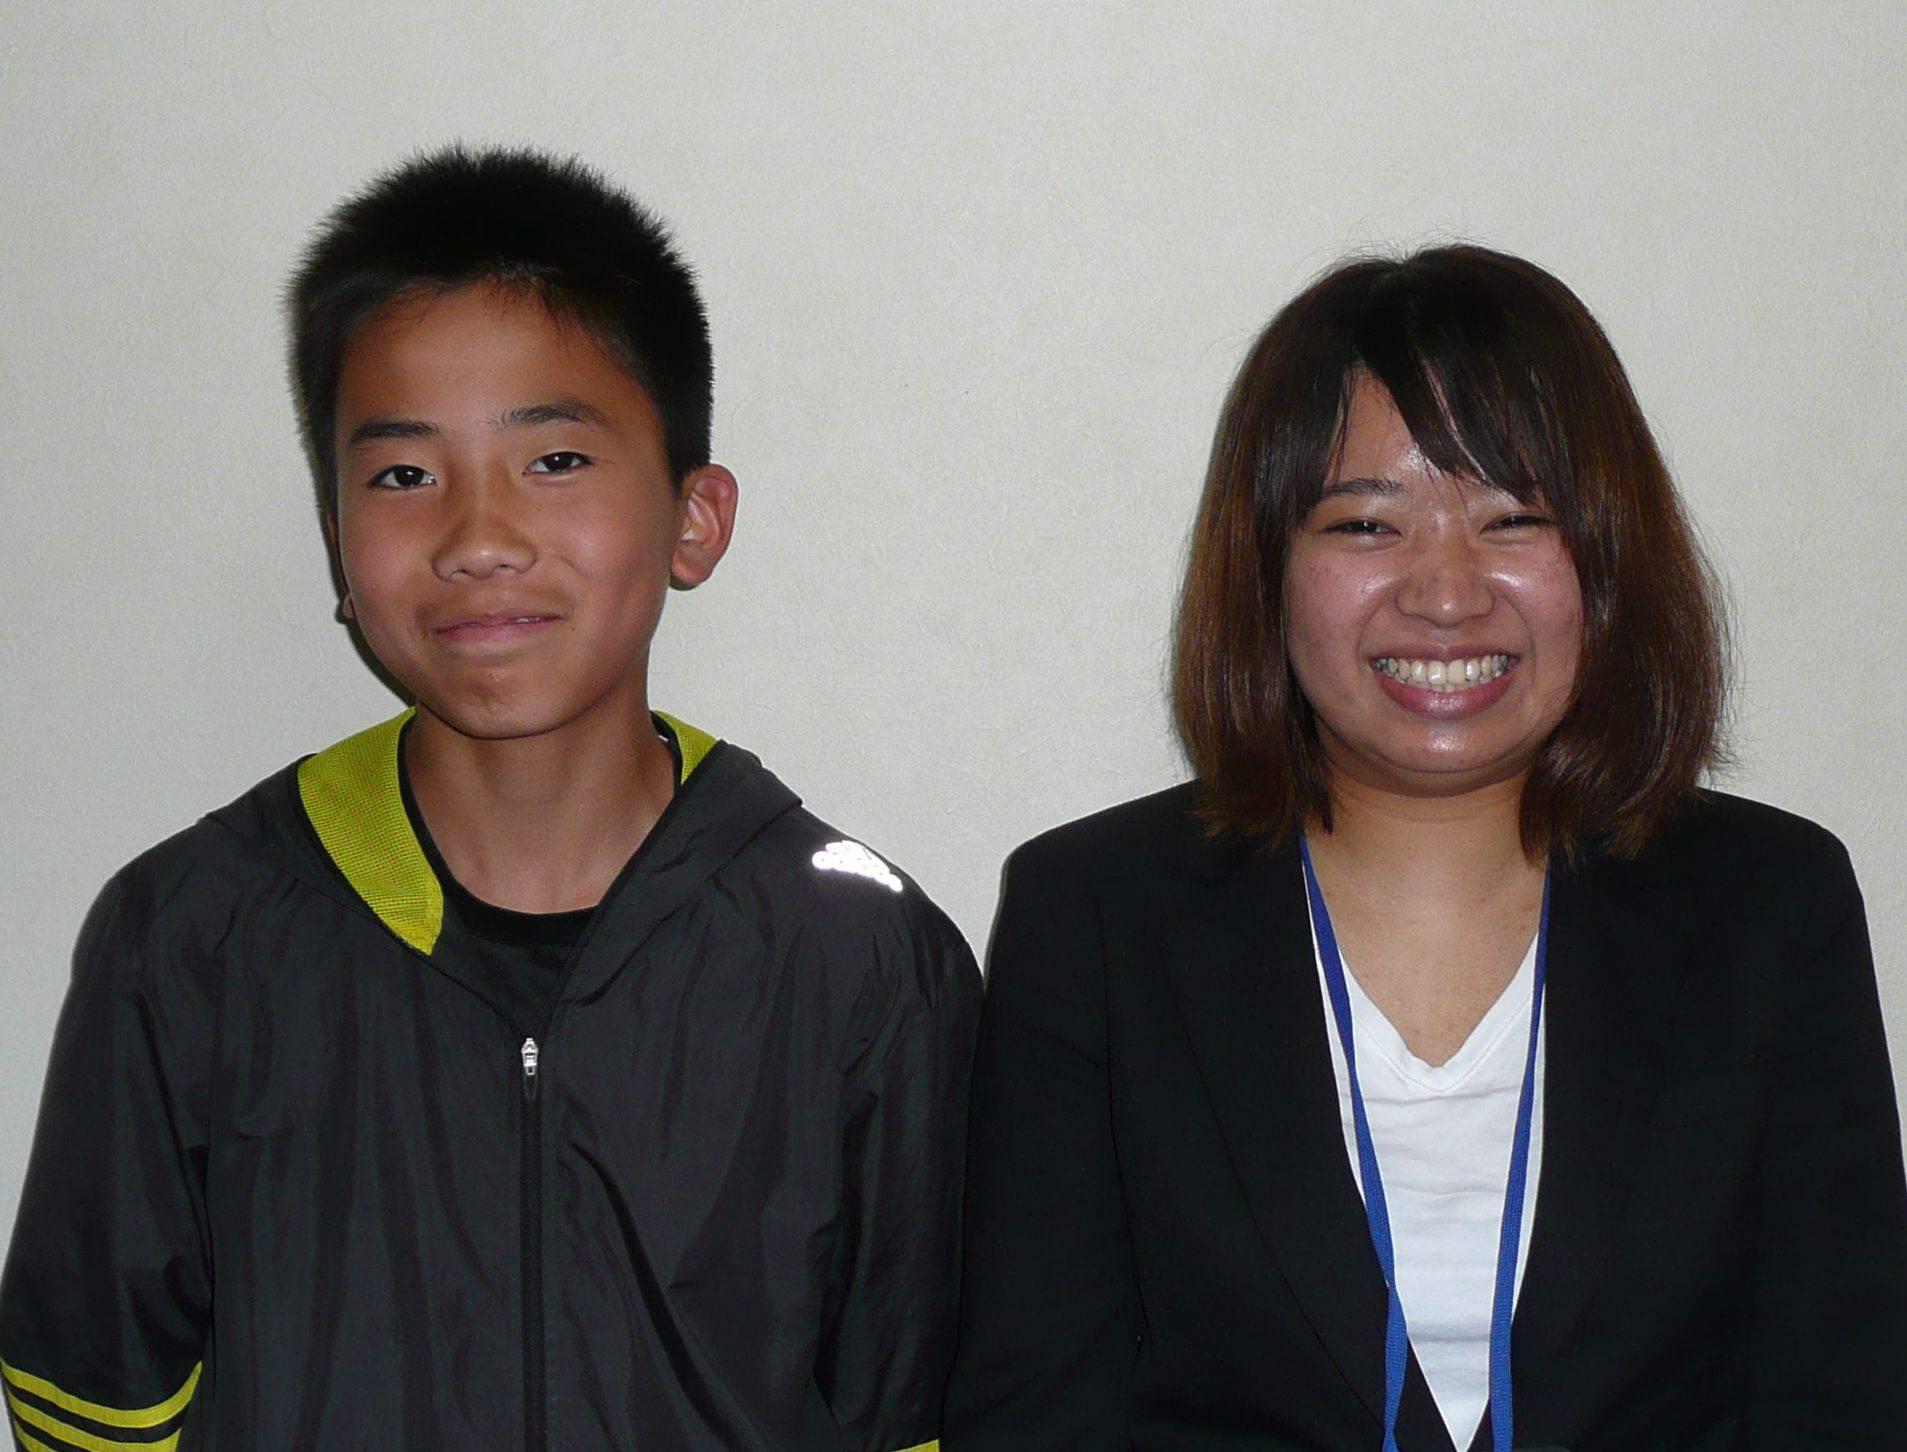 H29夏 中学3年 大六野壮琉くん 中村先生